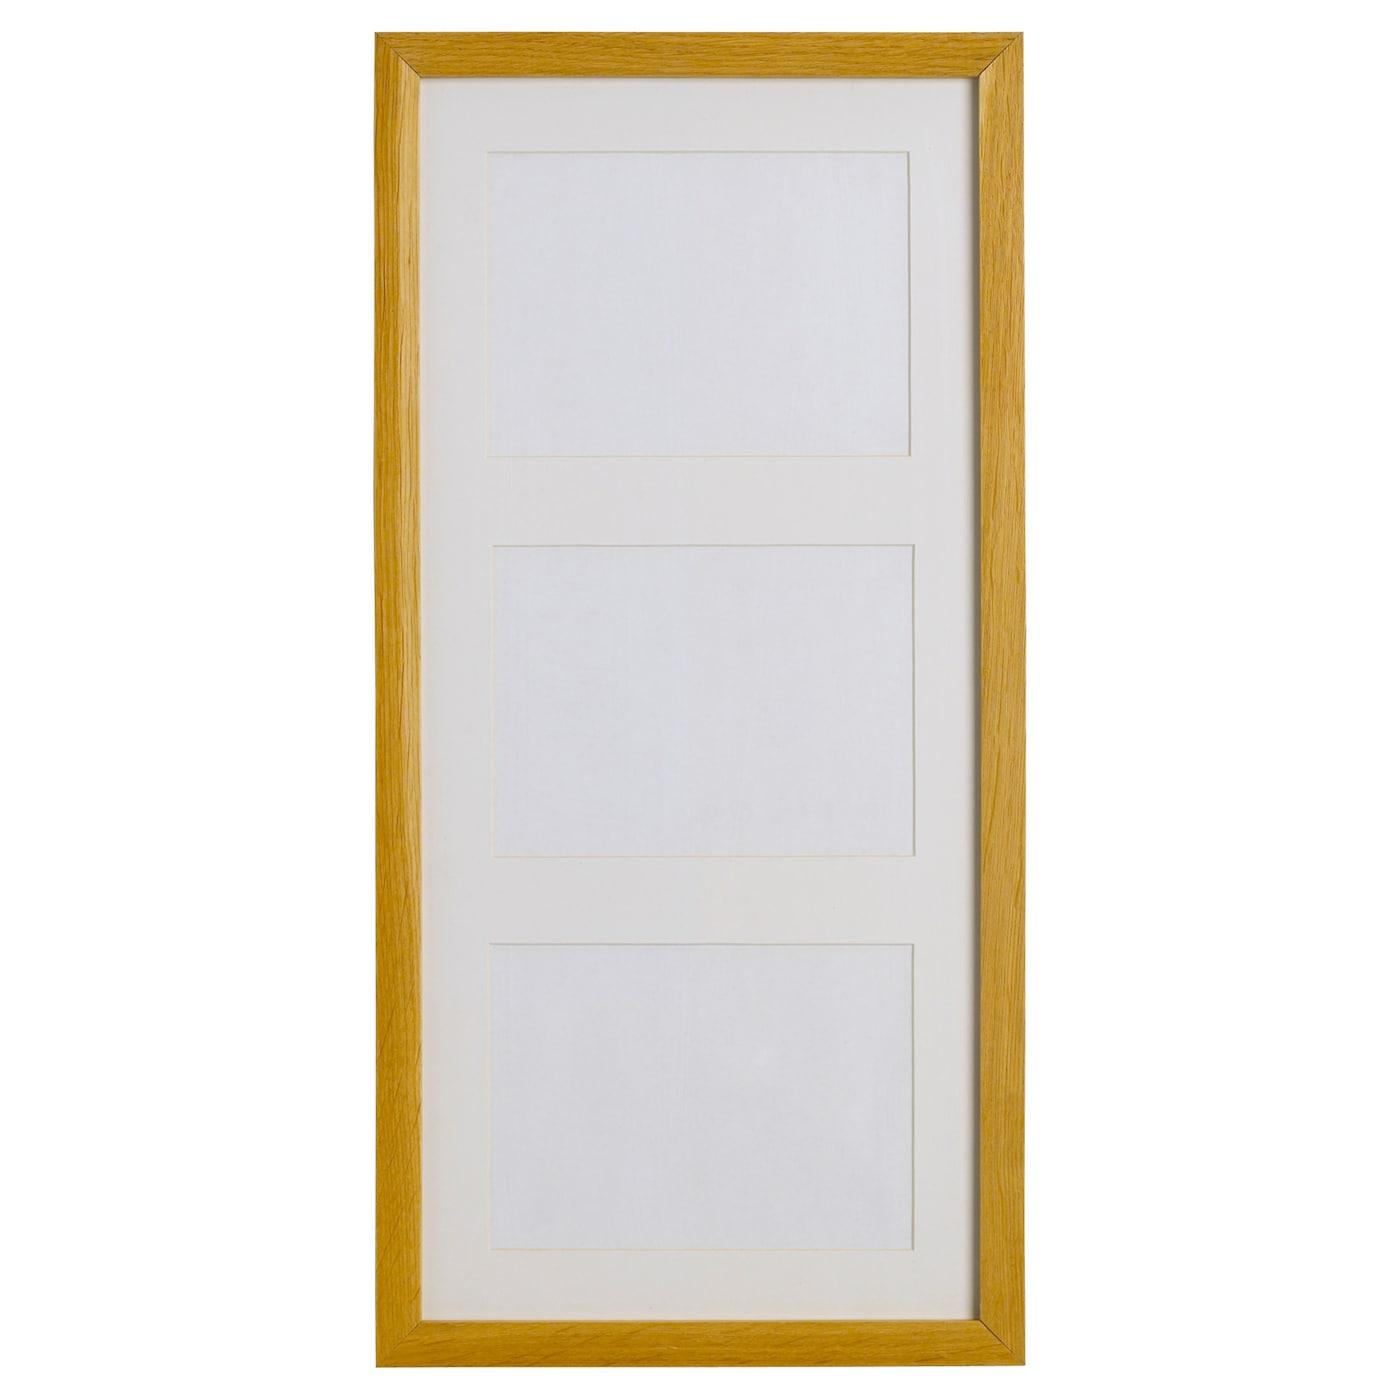 Frames - Wall Frames - IKEA